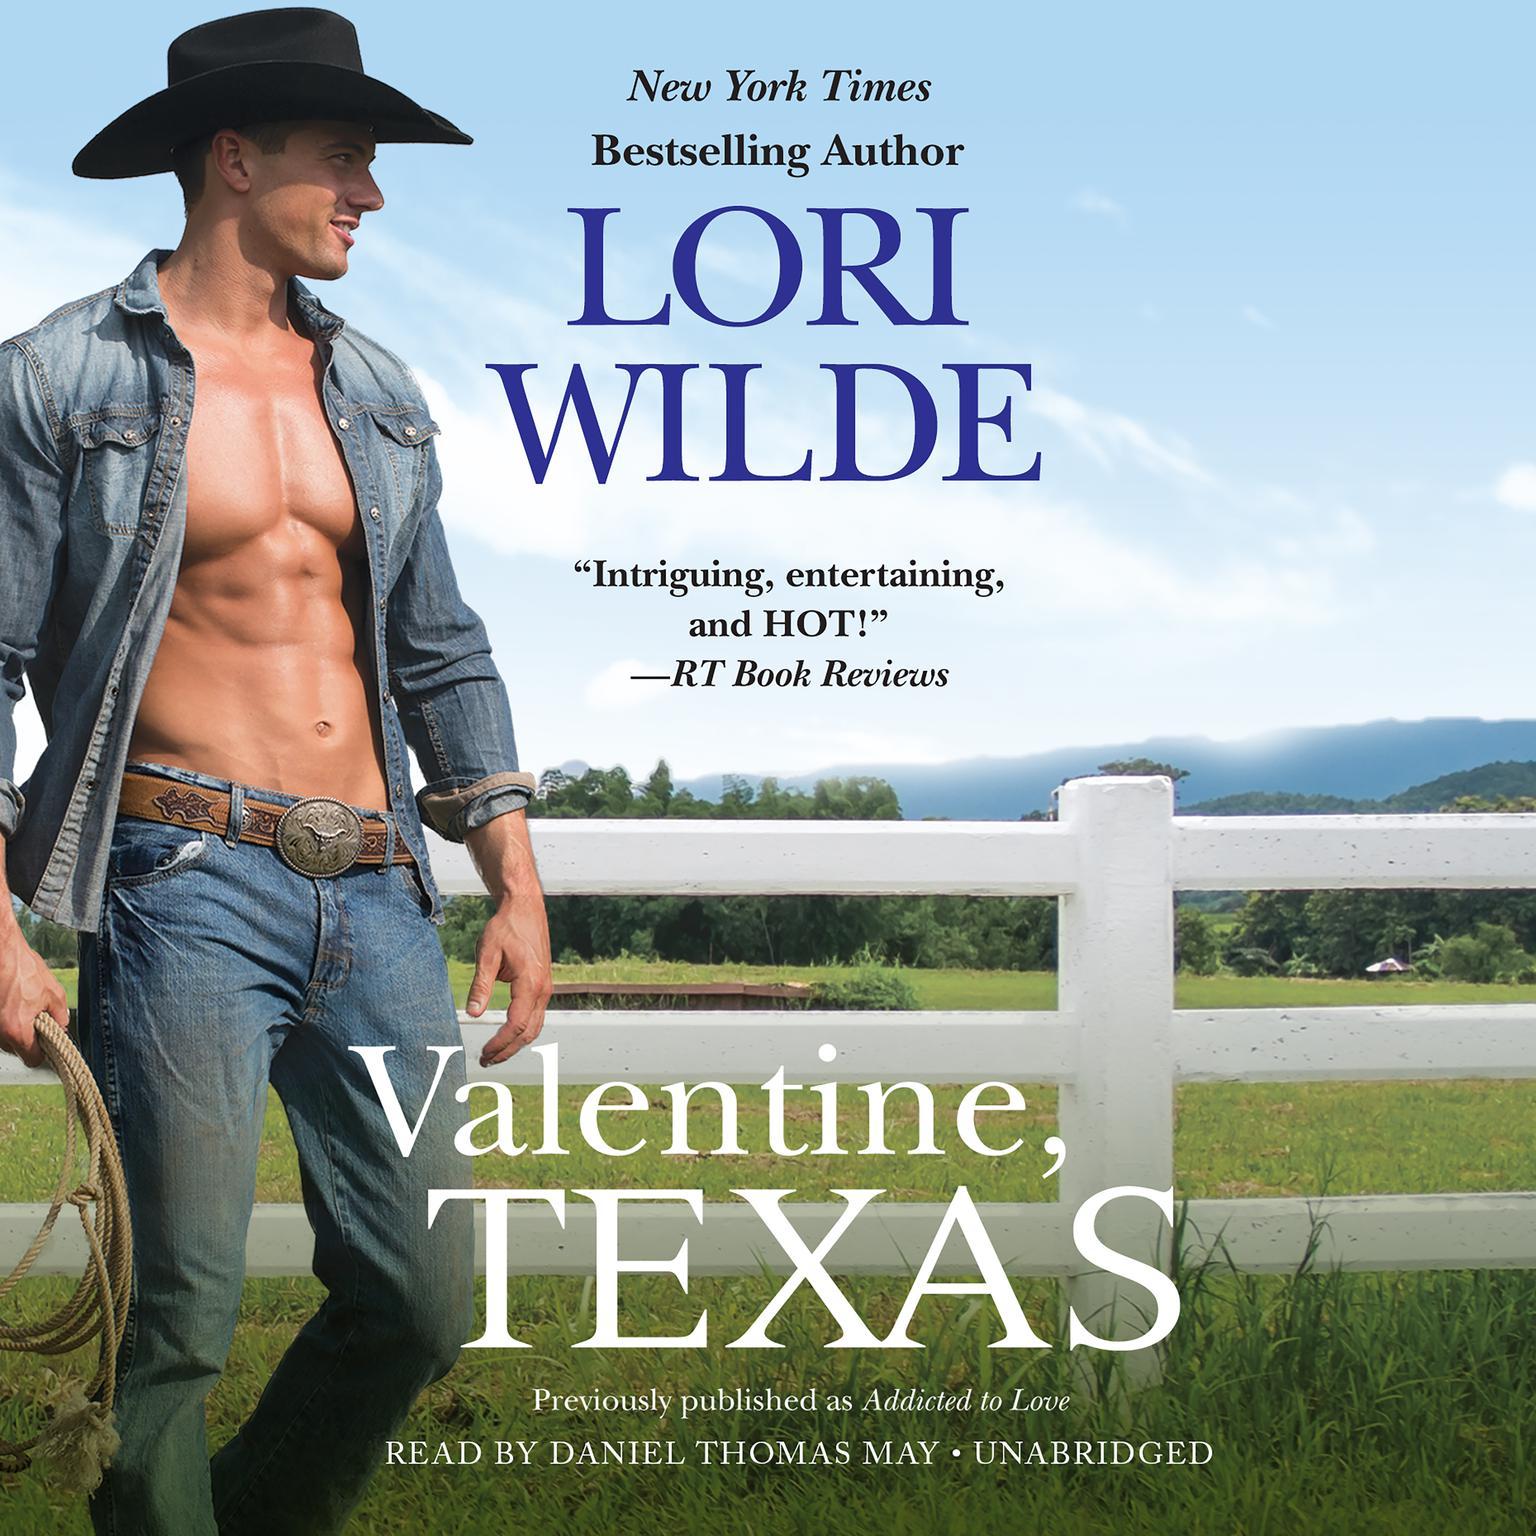 Valentine, Texas Audiobook, by Lori Wilde